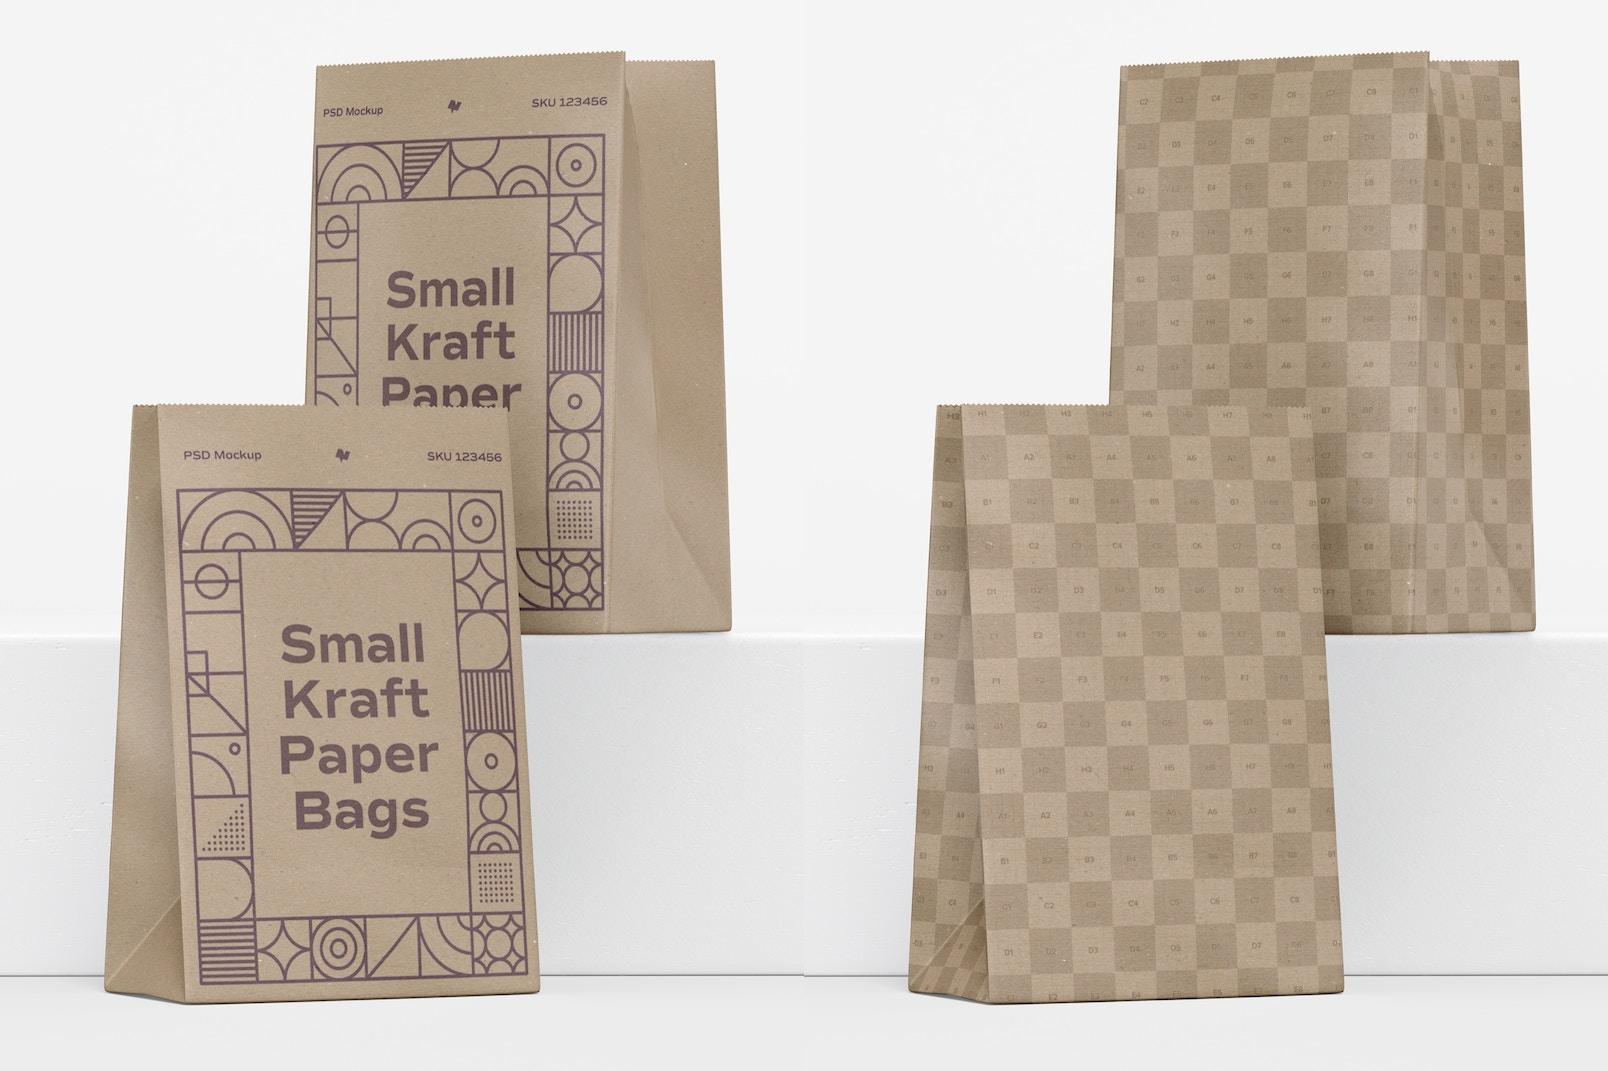 Small Kraft Paper Bags Mockup, Perspective